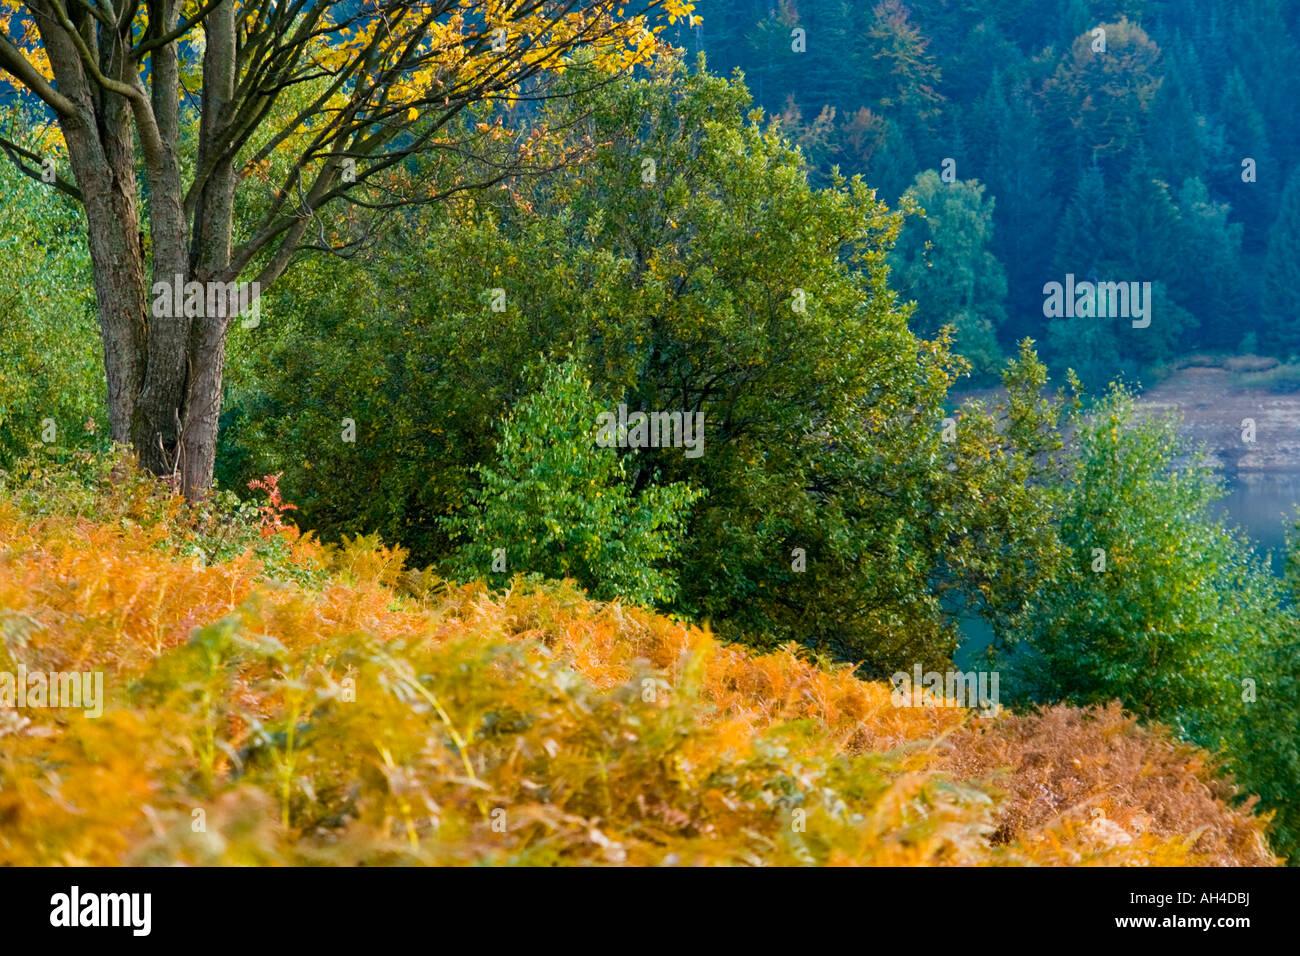 Autumn foliage vivid colors Stock Photo